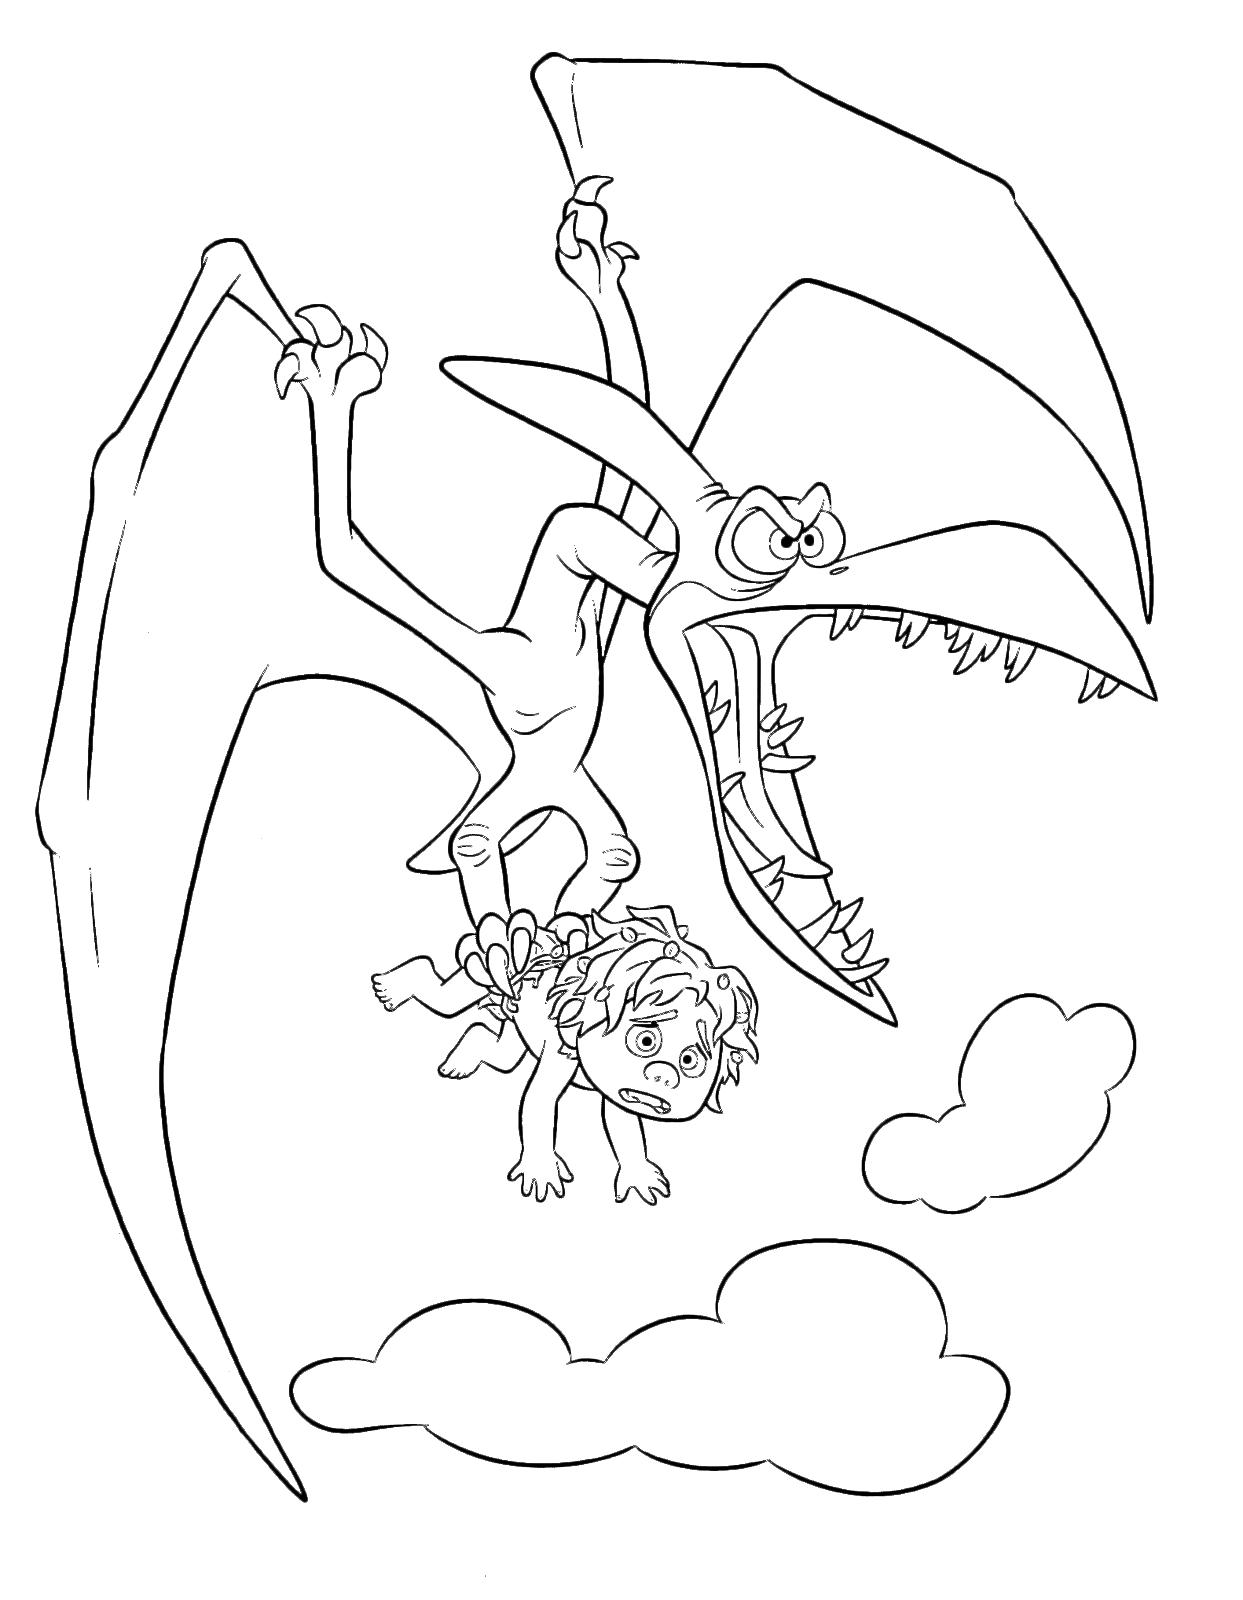 The Good Dinosaur Coloring Pages #GoodDino | Dinosaur coloring ... | 1600x1243